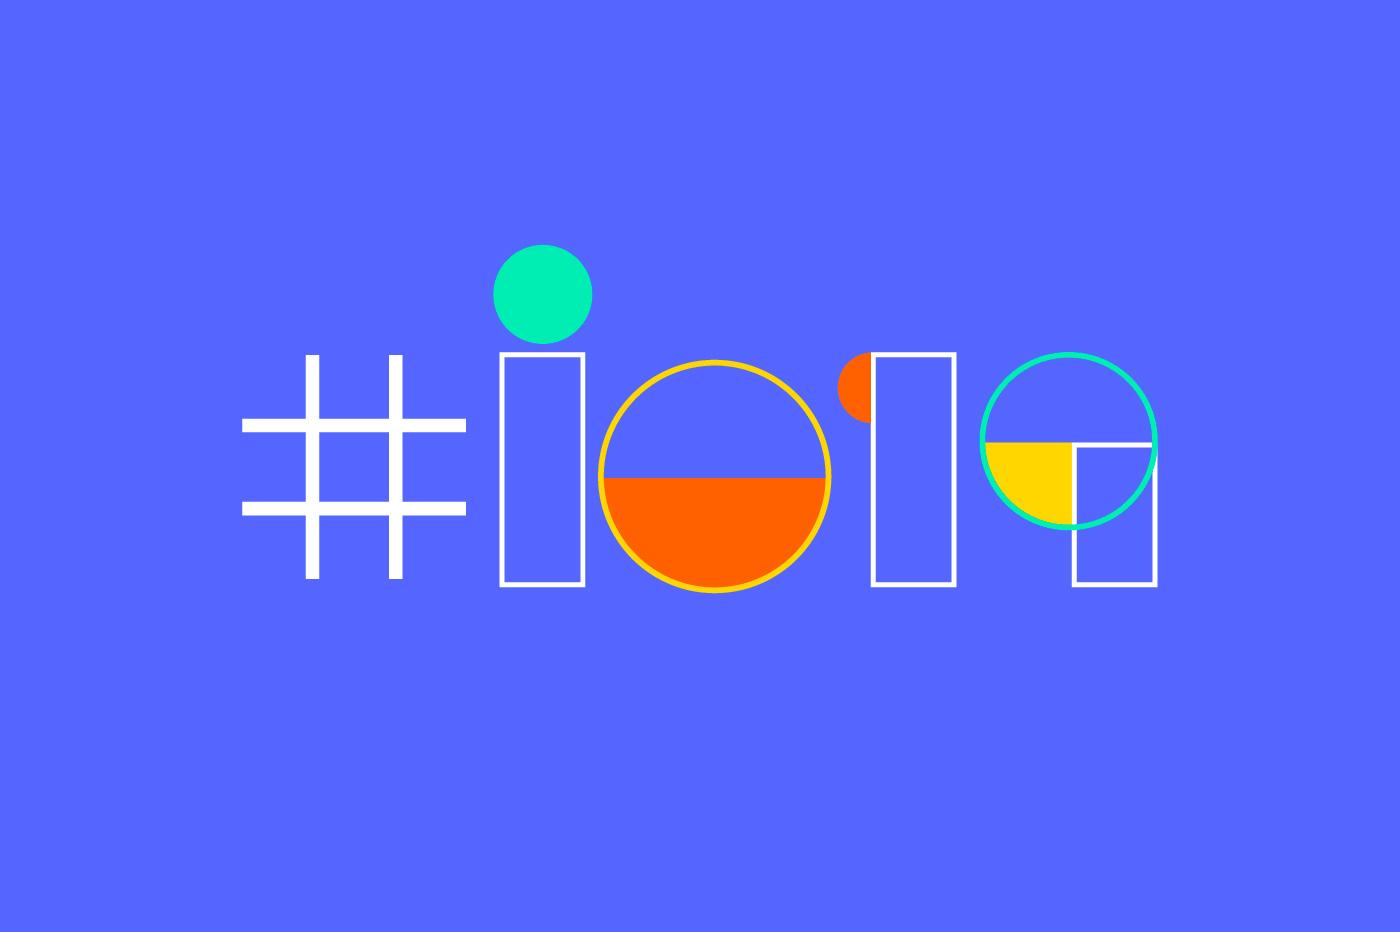 logo de la conférence Google I/O 2019